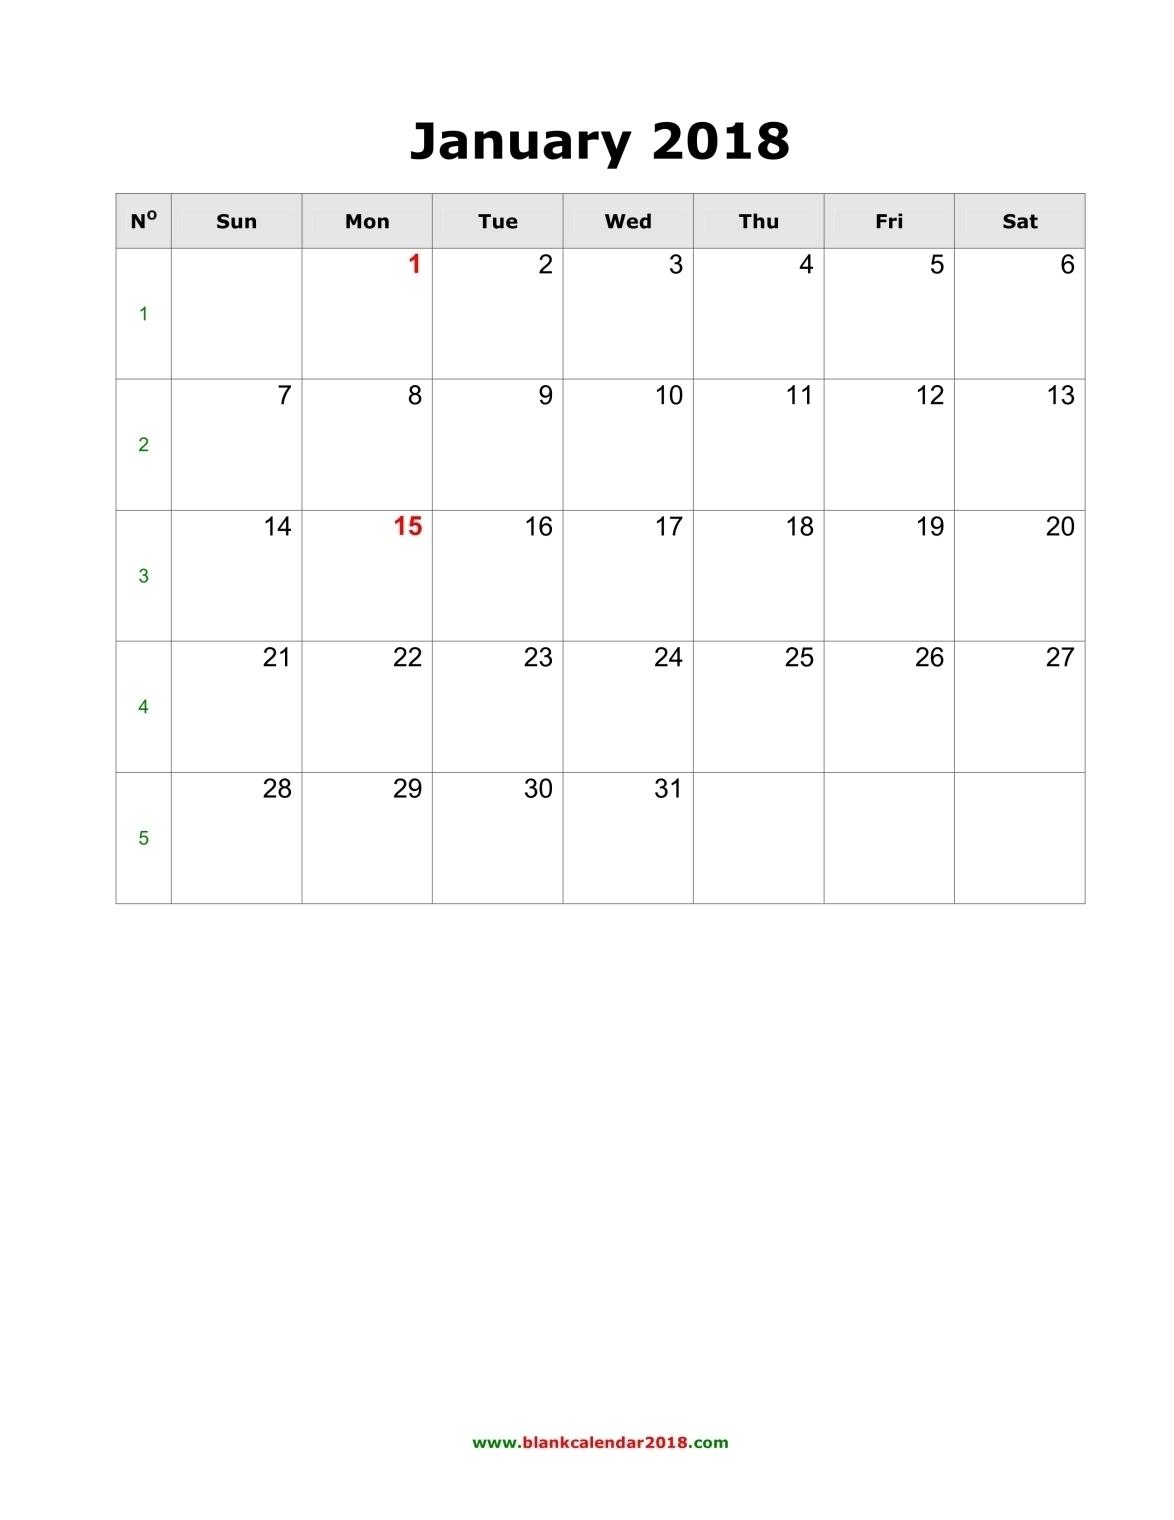 Blank Calendar 2018 regarding Monthly Calendars Monday Through Friday